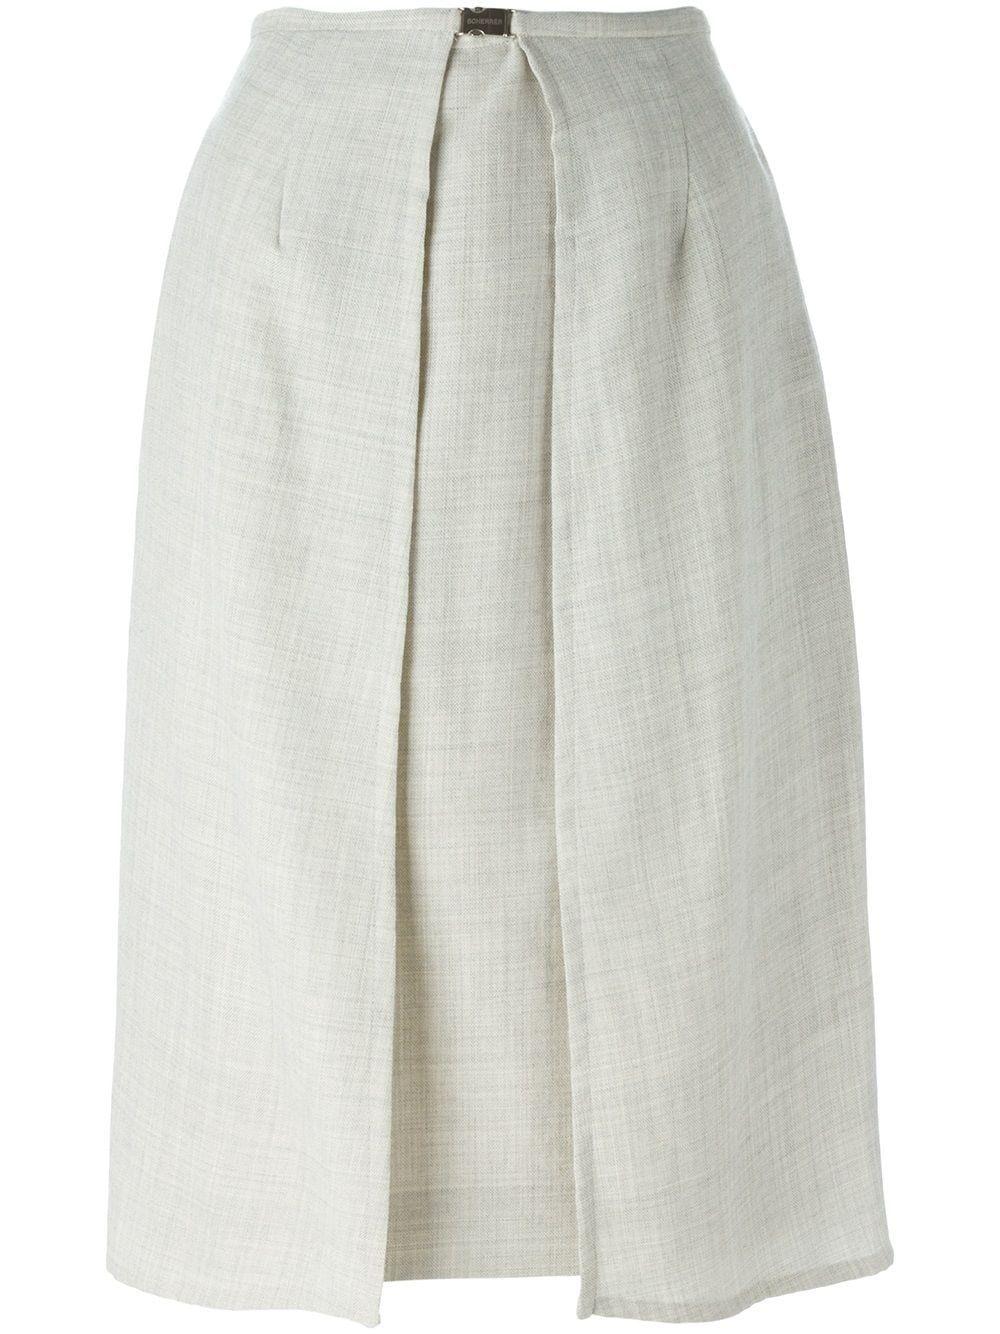 90fd95f5b0 Jean Louis Scherrer Pre-Owned panelled skirt - Grey in 2019 ...